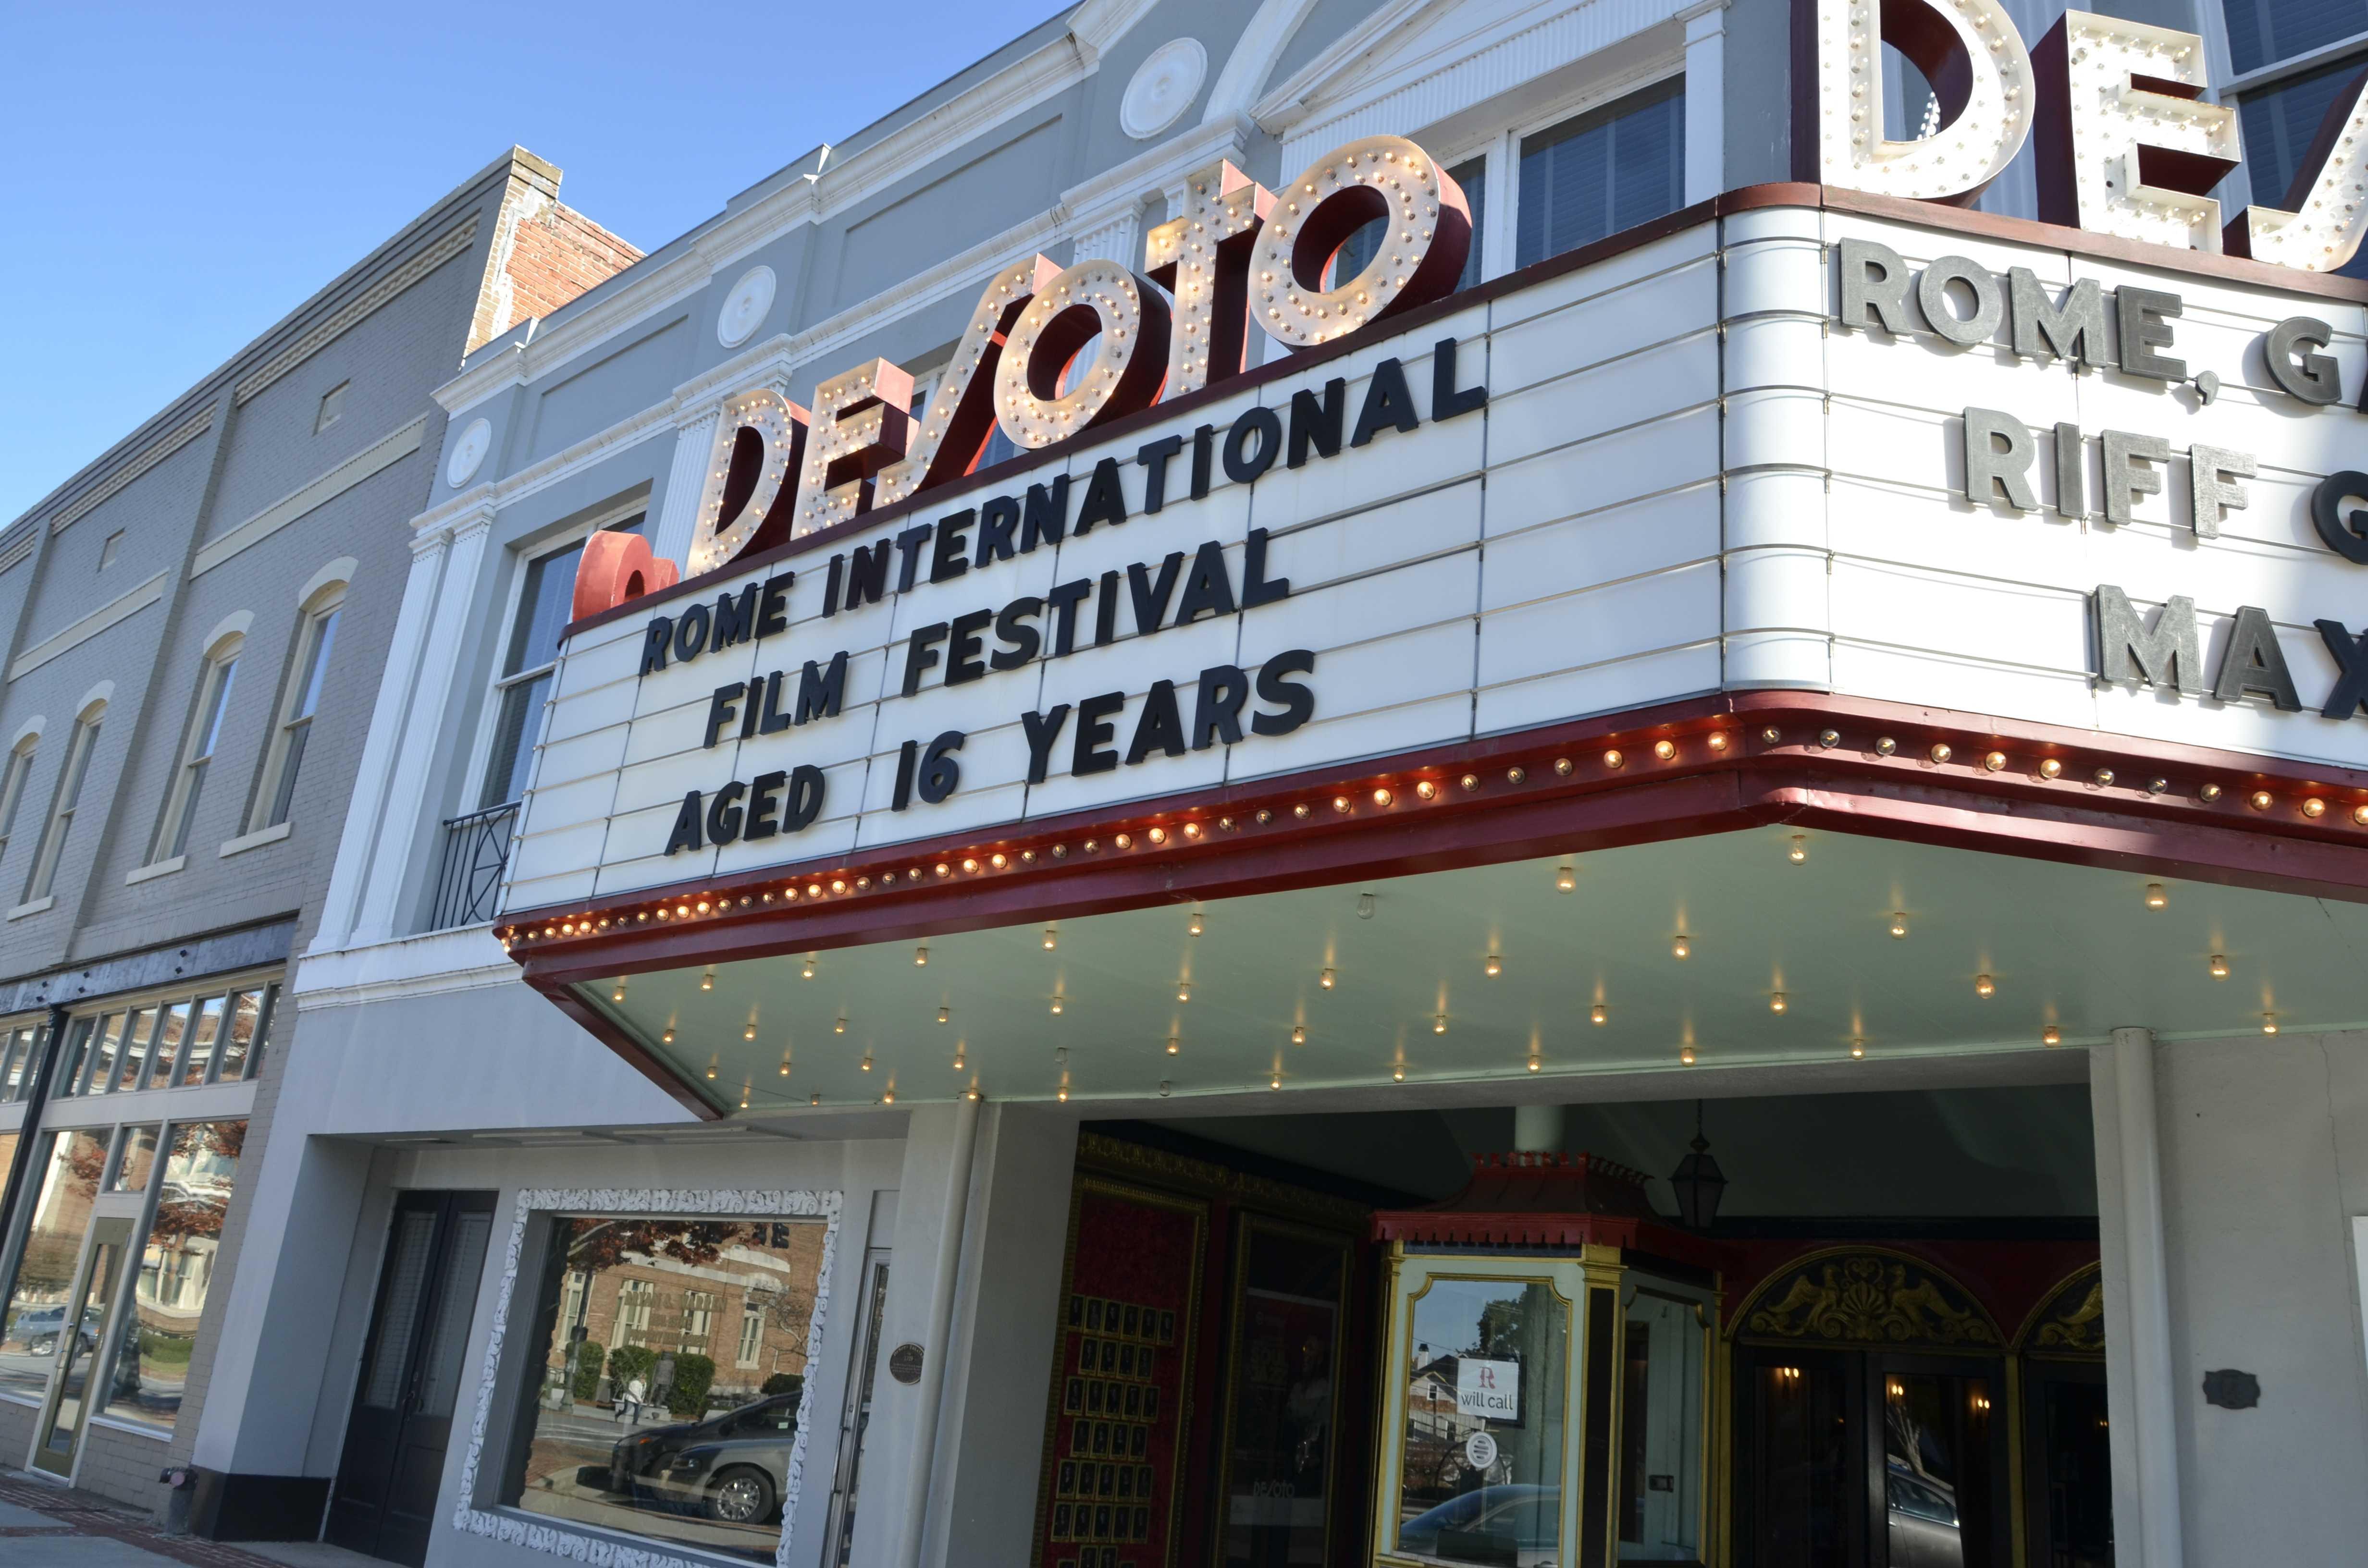 Rome International Film Festival is at the Desoto Theatre